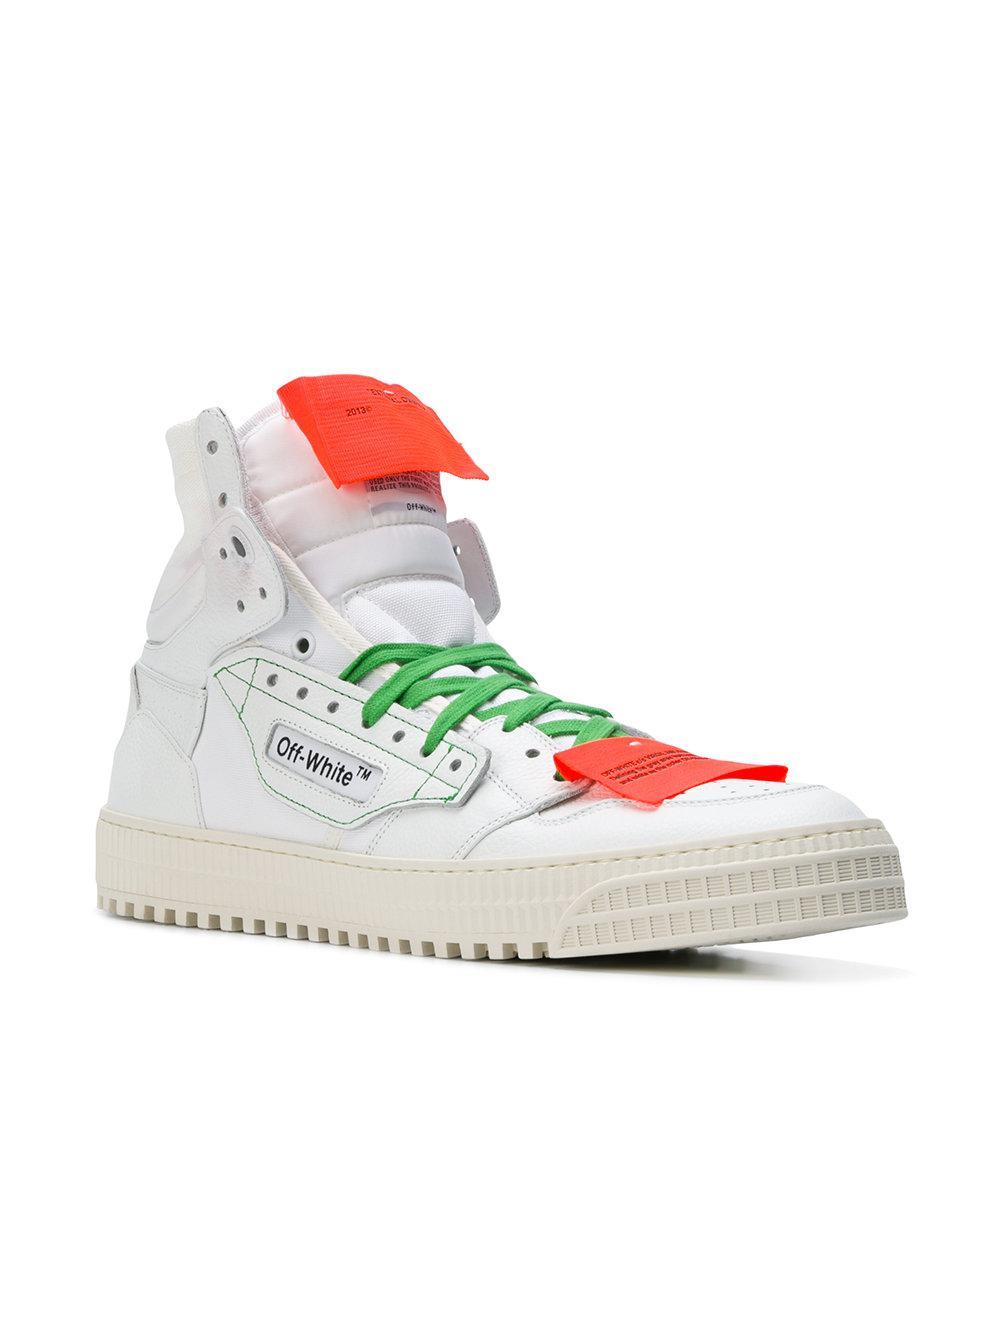 719ab7190d81 Off-White c o Virgil Abloh 3.0 Hi-top Sneakers in White for Men - Lyst